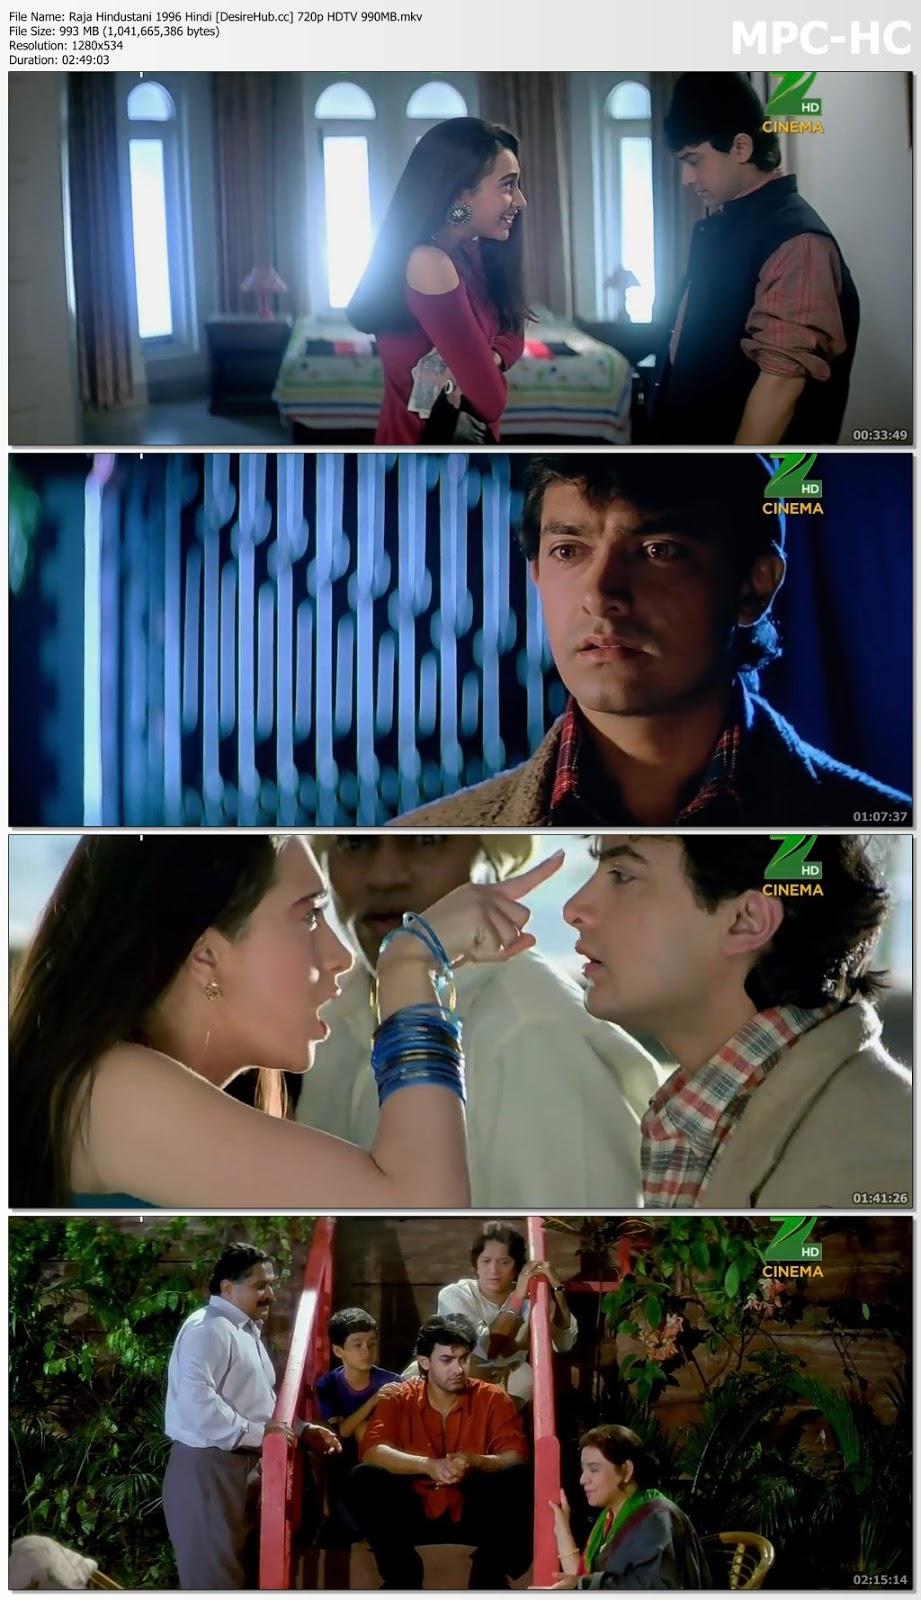 Raja Hindustani 1996 Hindi 720p HDTV 990MB Desirehub